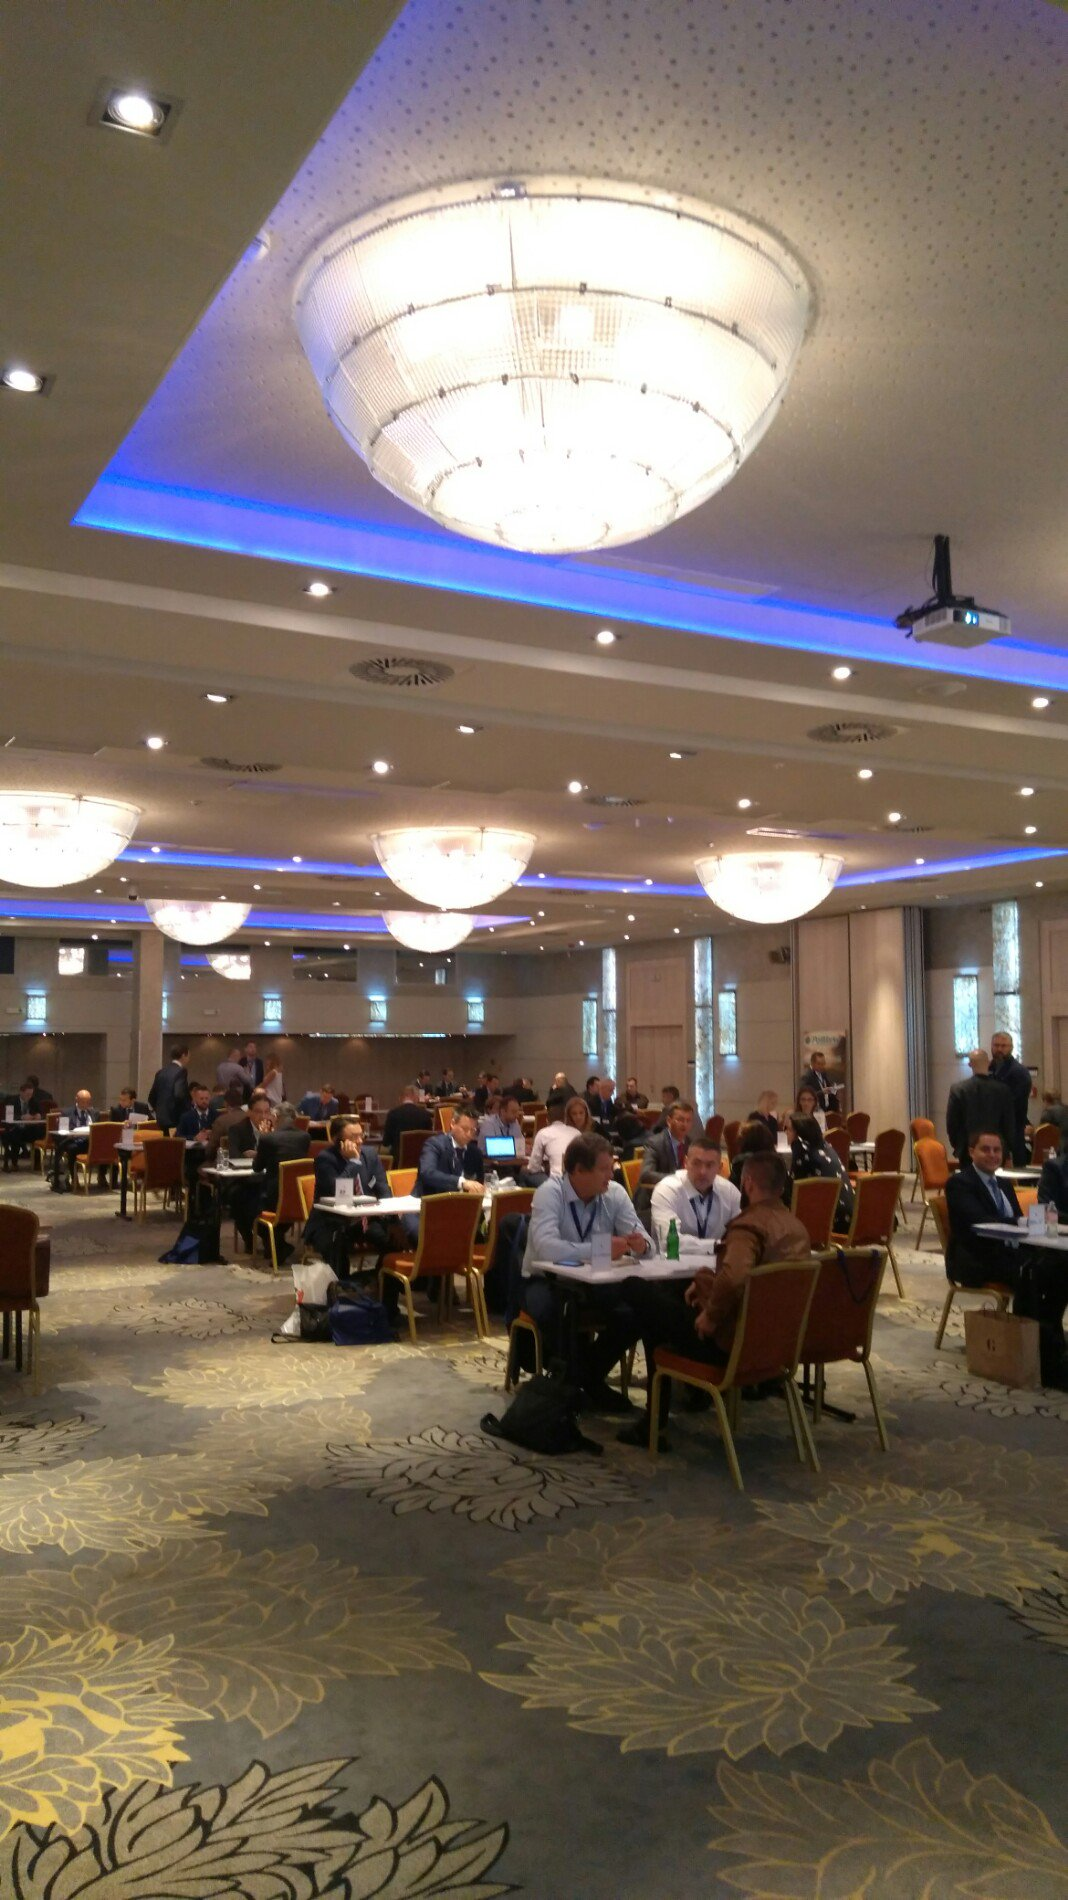 2nd Central European Plastics Meeting (@ Hotel Azúr - @hotelazur in Siófok, Somogy) https://t.co/IBP7b0Q2mx https://t.co/hztvSQk3u5